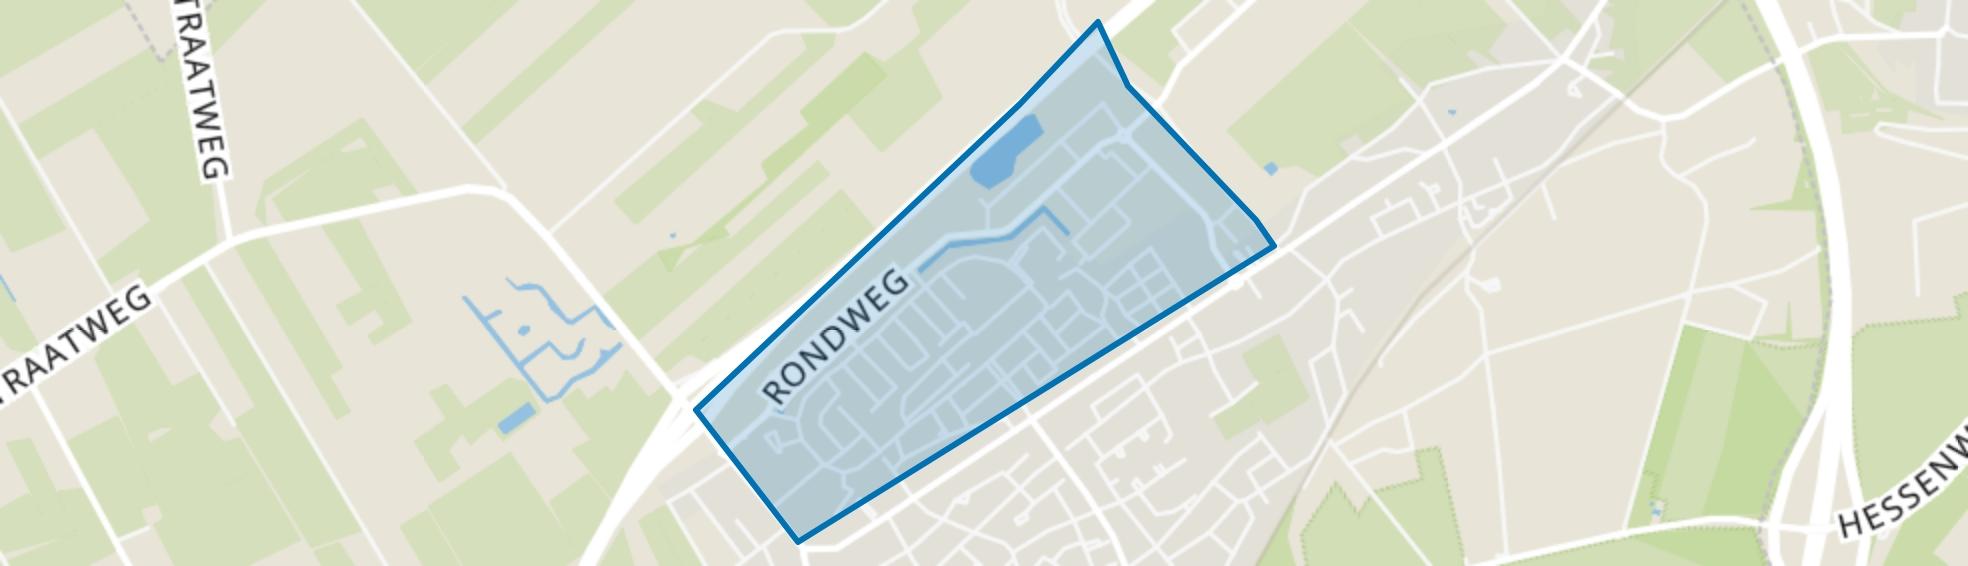 Wezep-Noord, Wezep map